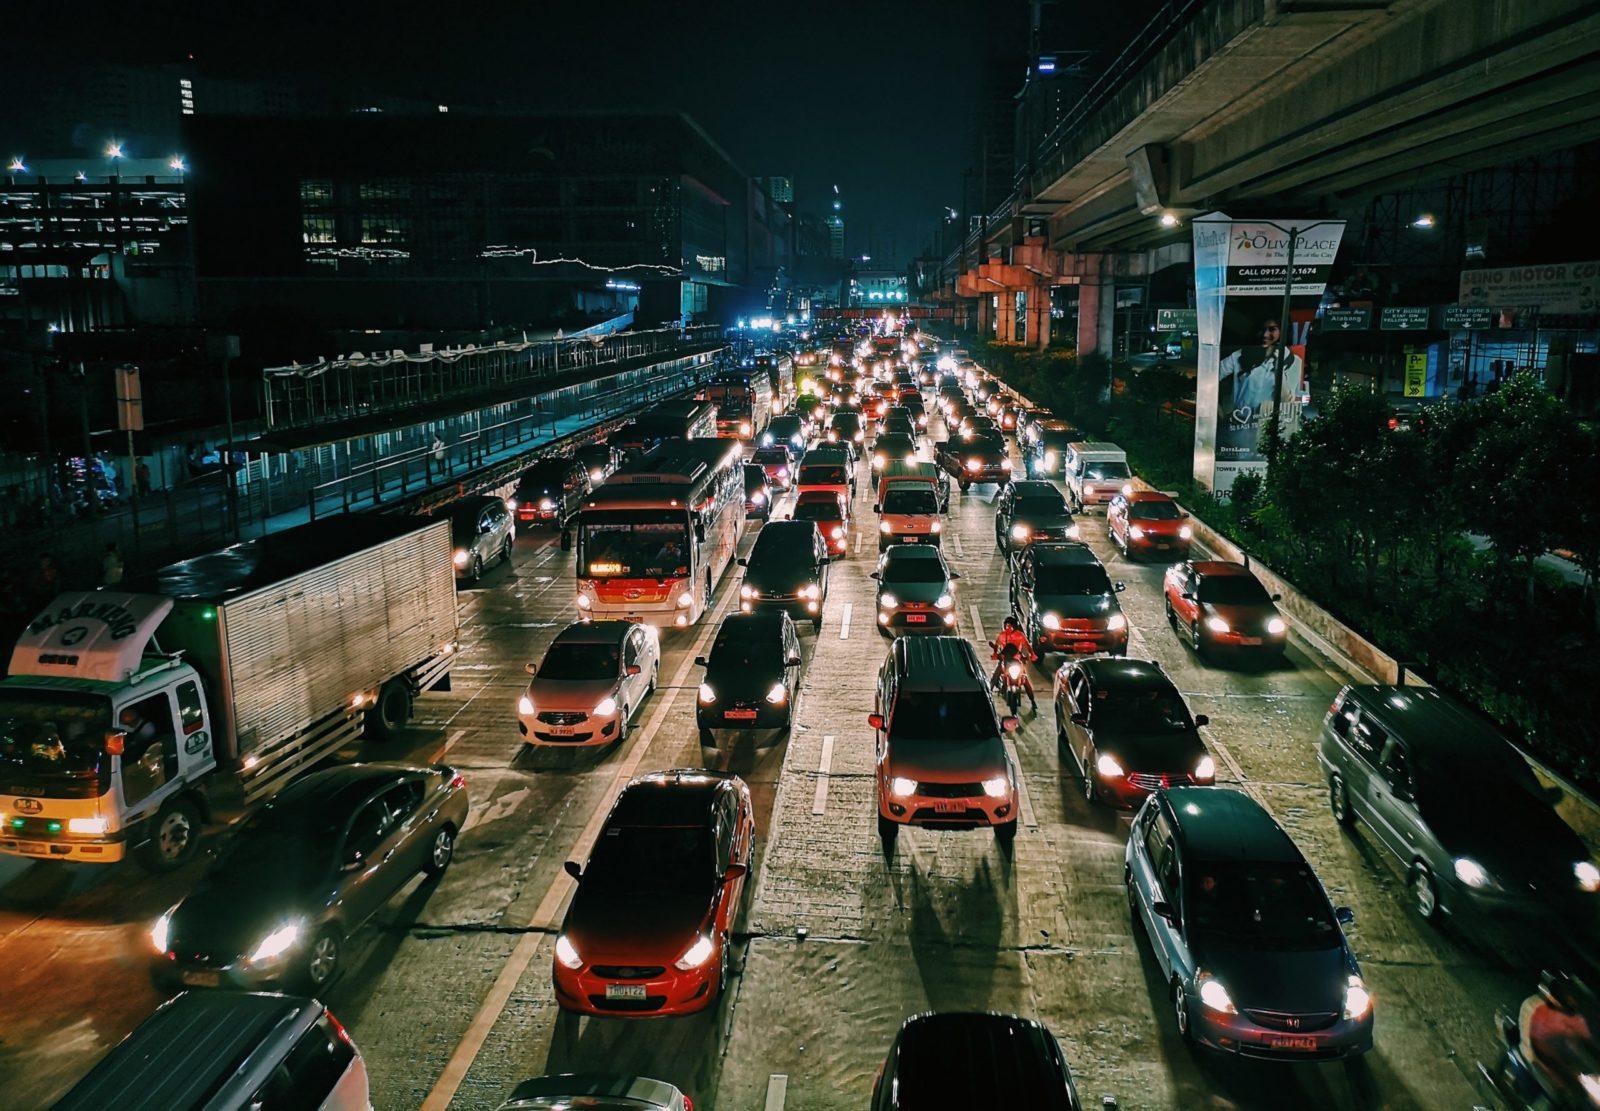 samochody-ulica-miasto